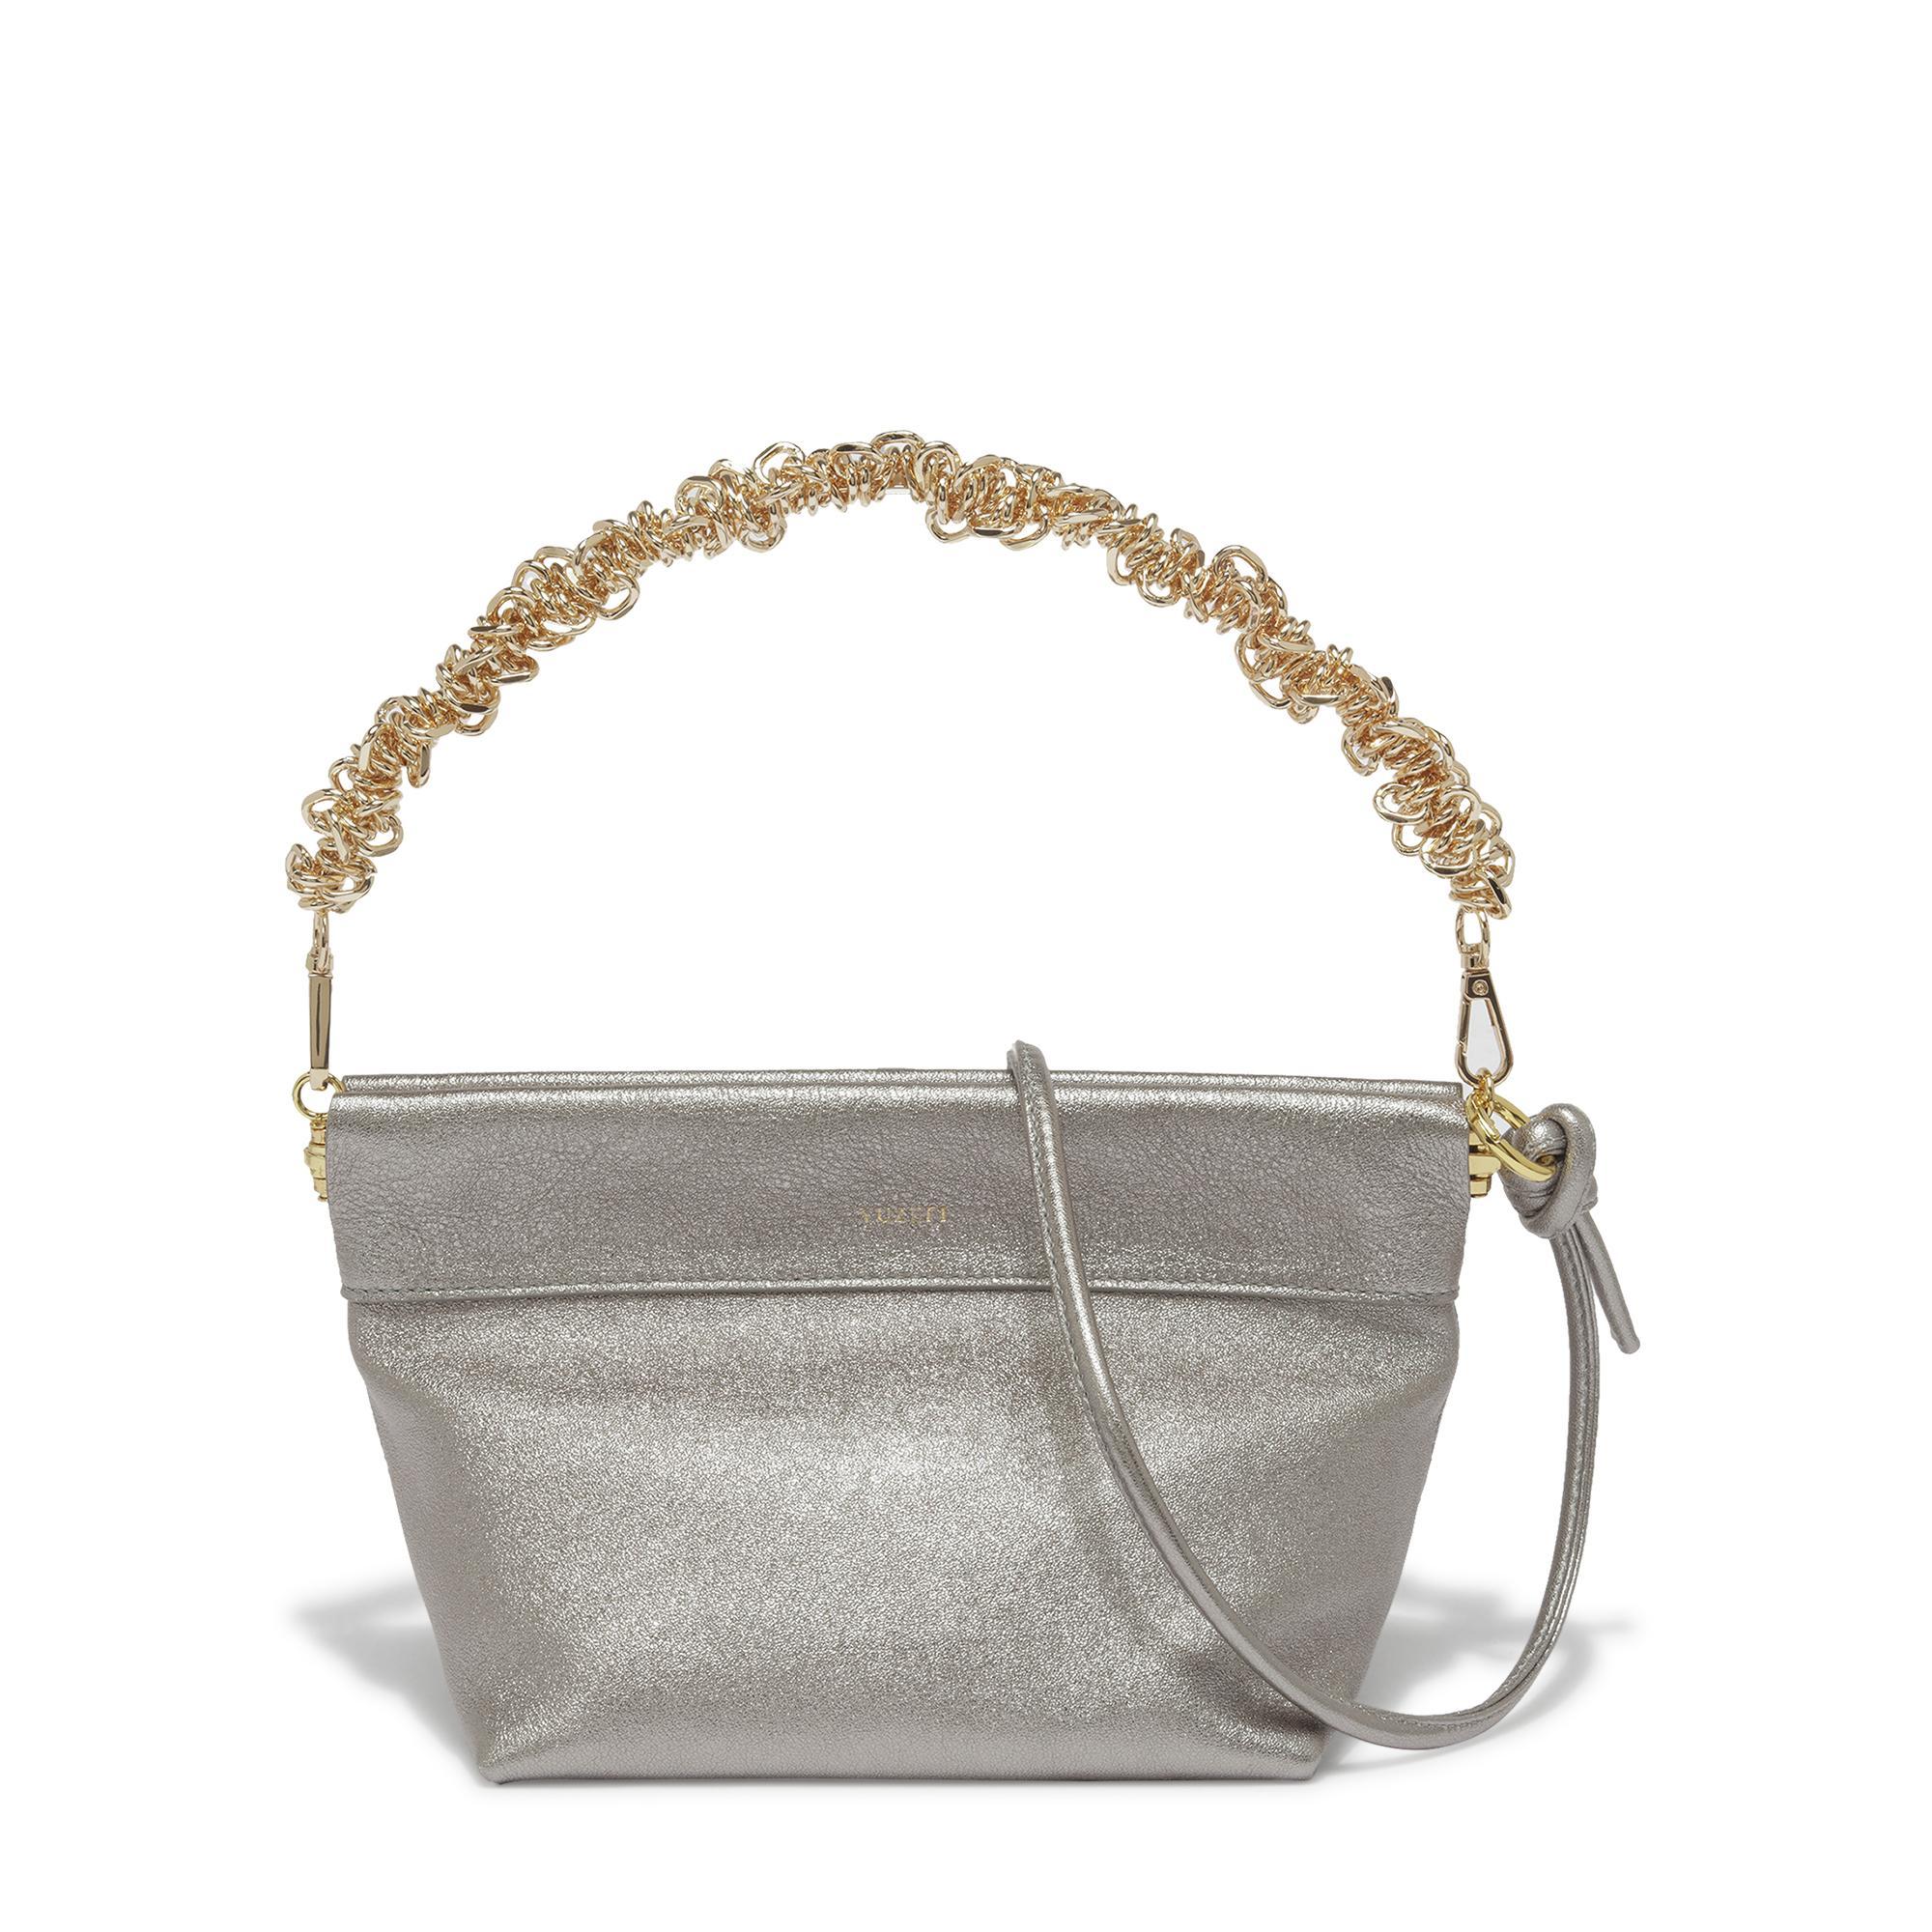 Giant Coin purse bag